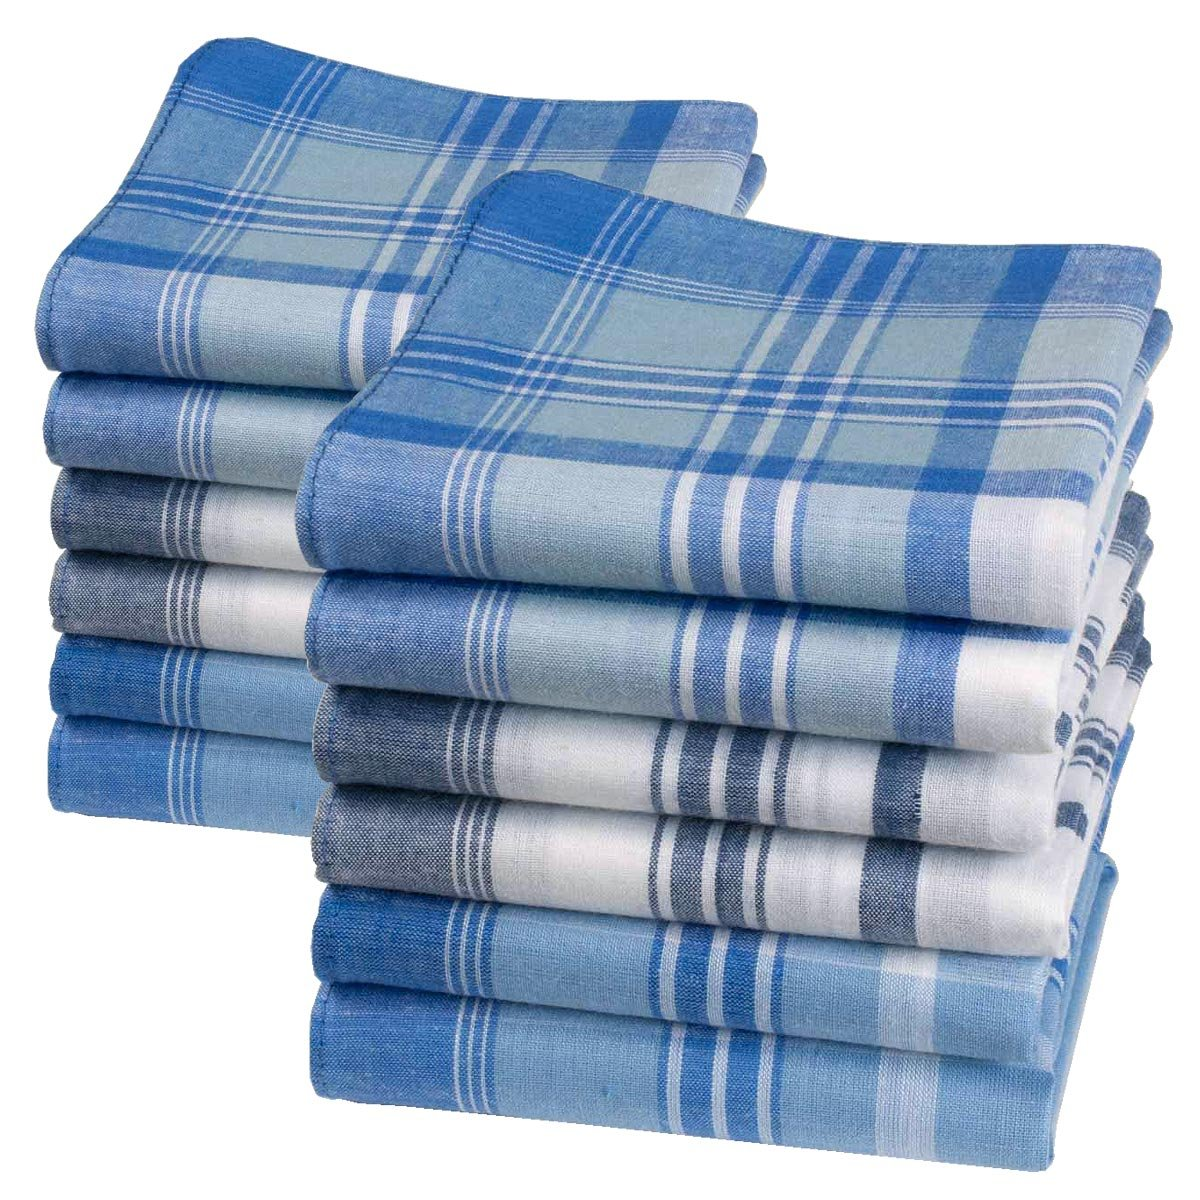 "Men's handkerchiefs ""Oscar"" – 16"" square – 6 units Merrysquare"